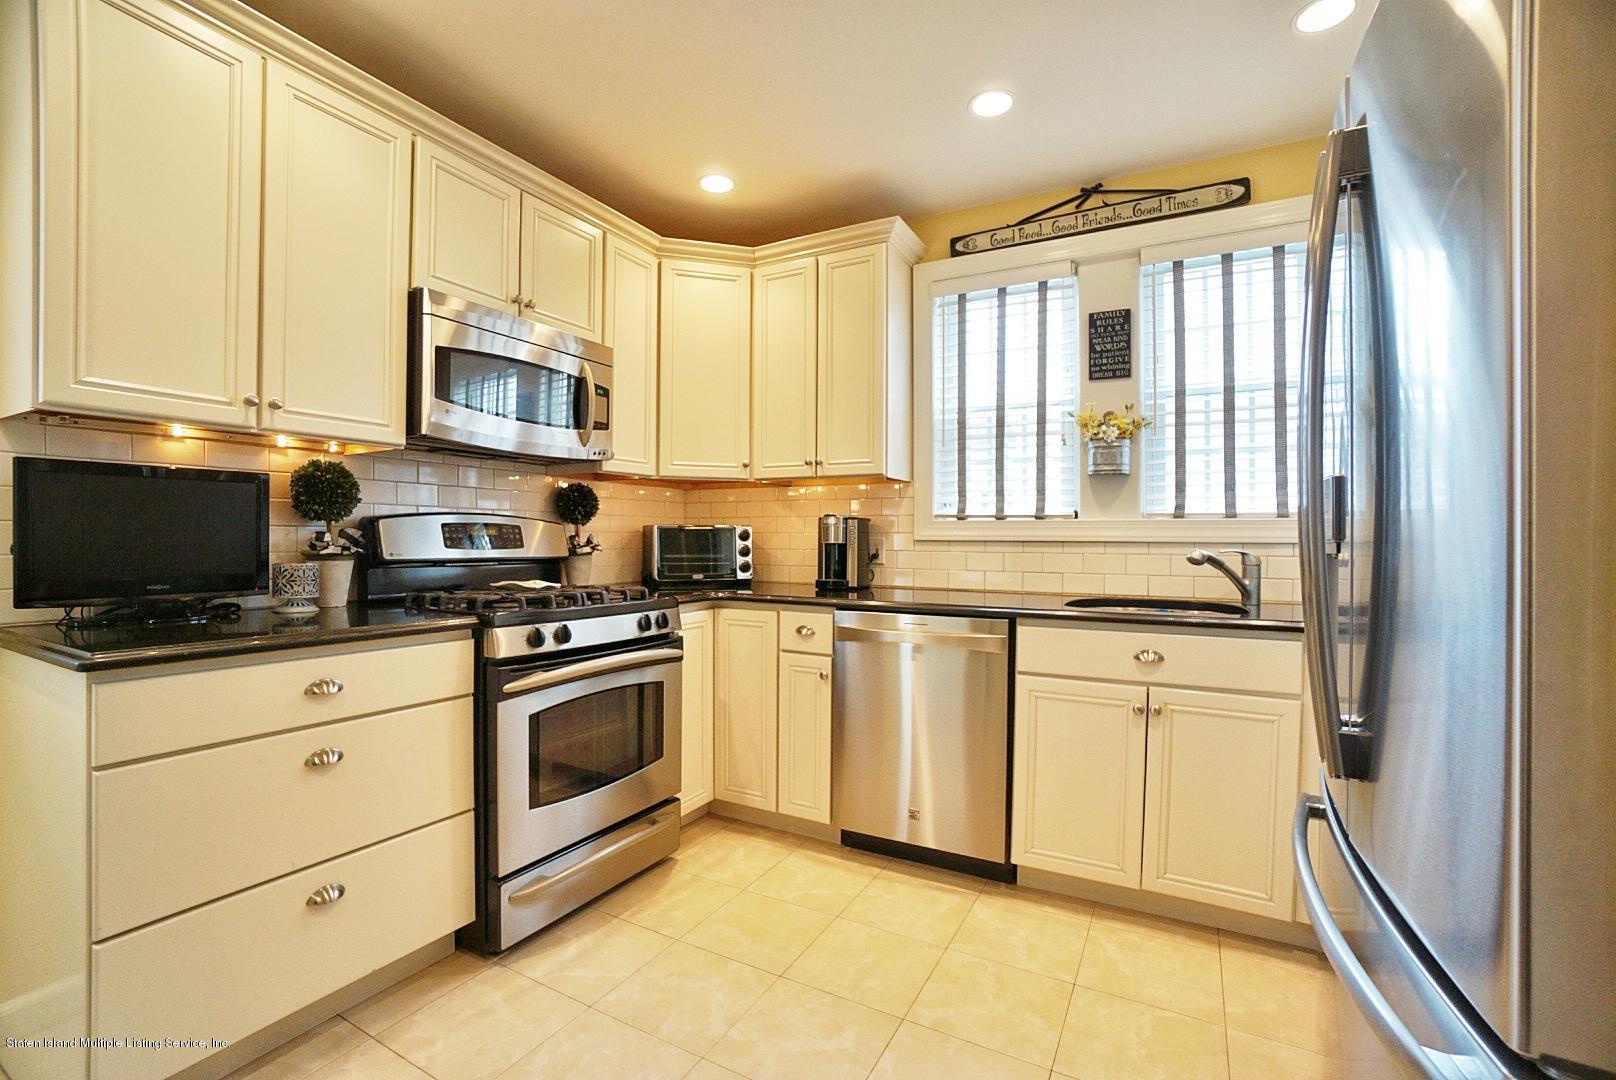 Single Family - Detached 171 Keiber Court  Staten Island, NY 10314, MLS-1127425-18